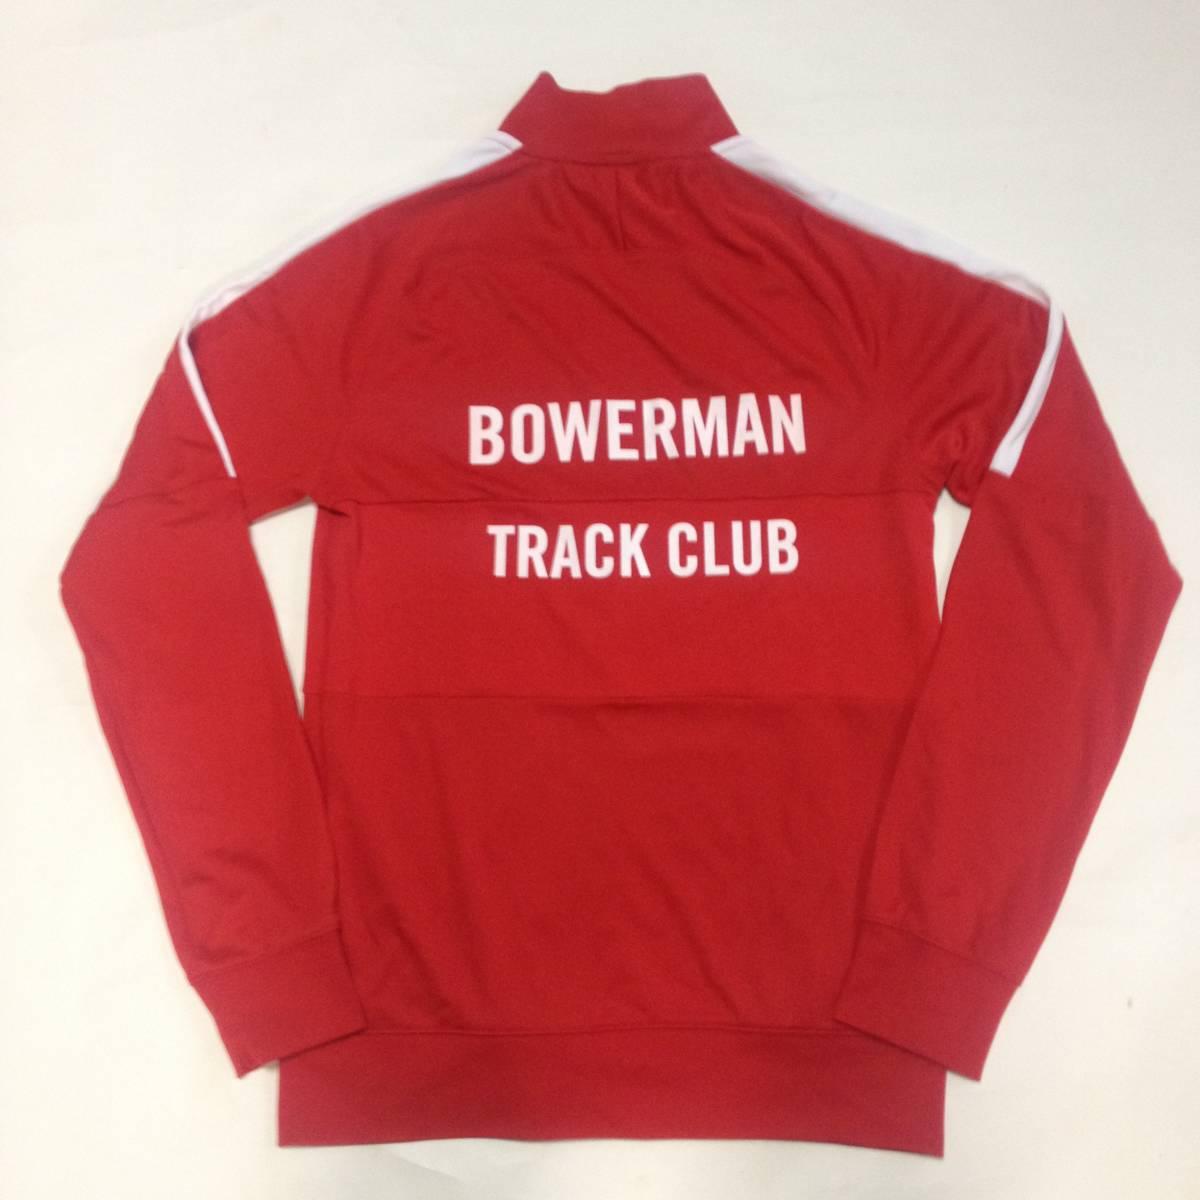 【Sサイズ】BTC Track Jacket 2.0【Bowerman Track Club】